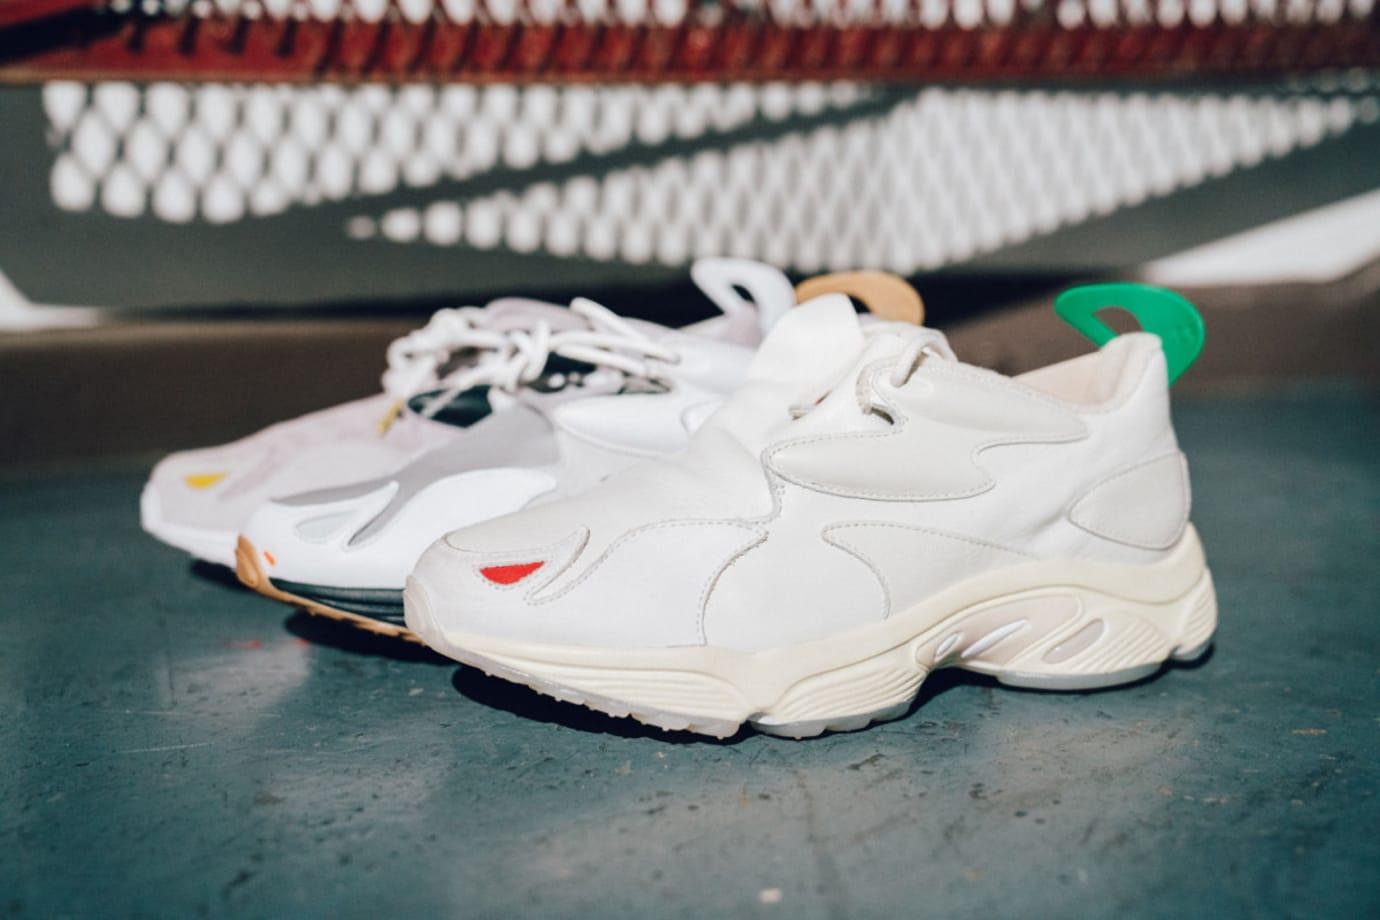 pyer-moss-studio-sneakers-highsnobiety